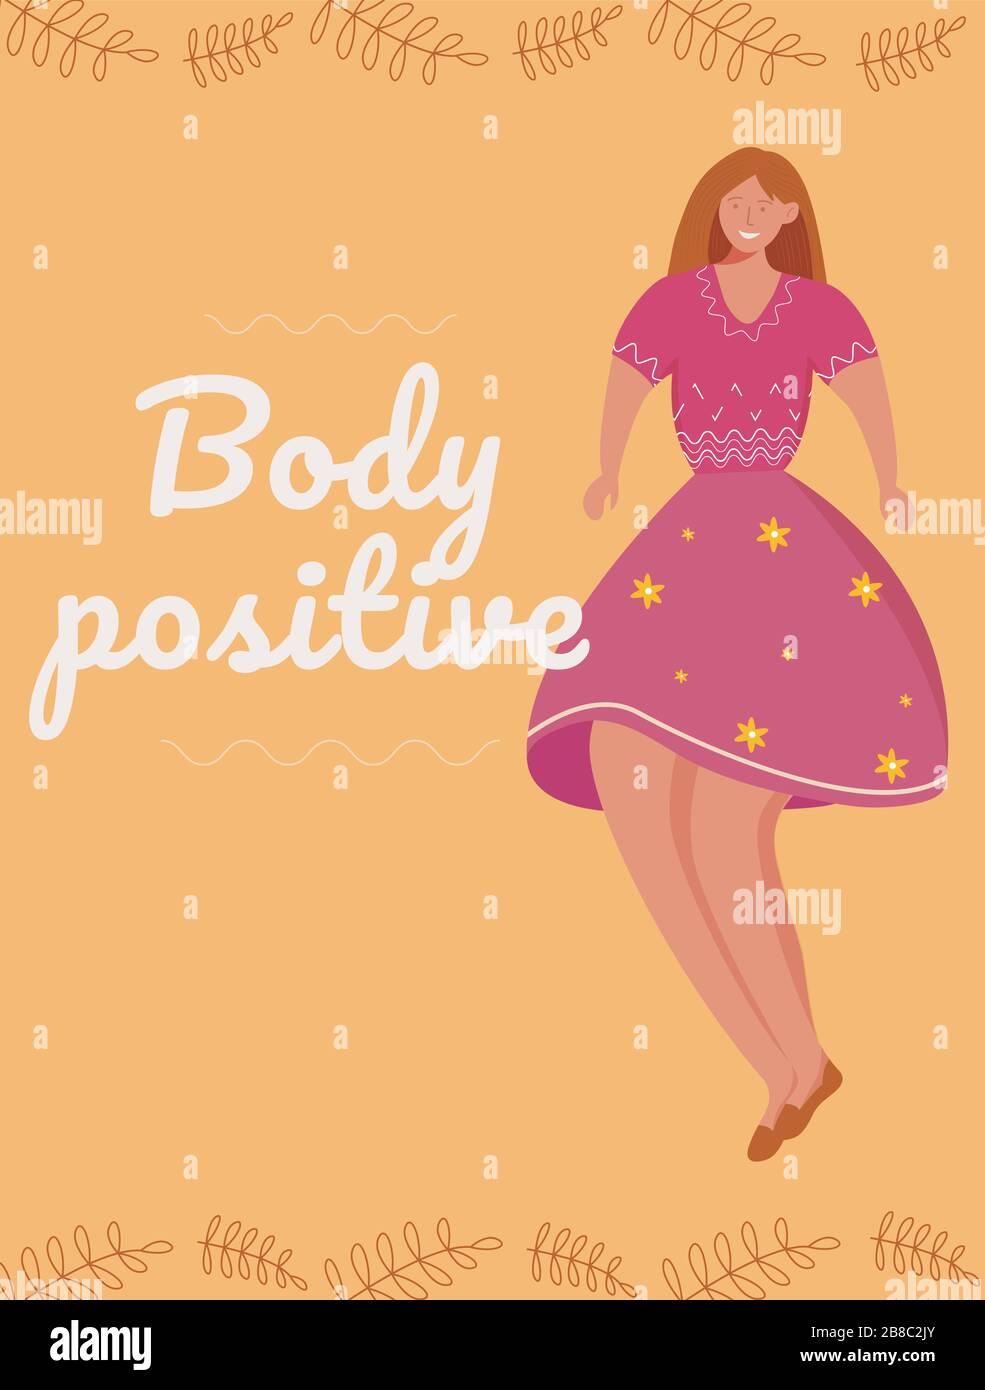 Body Positive Poster Vector Template Stock Vector Image Art Alamy